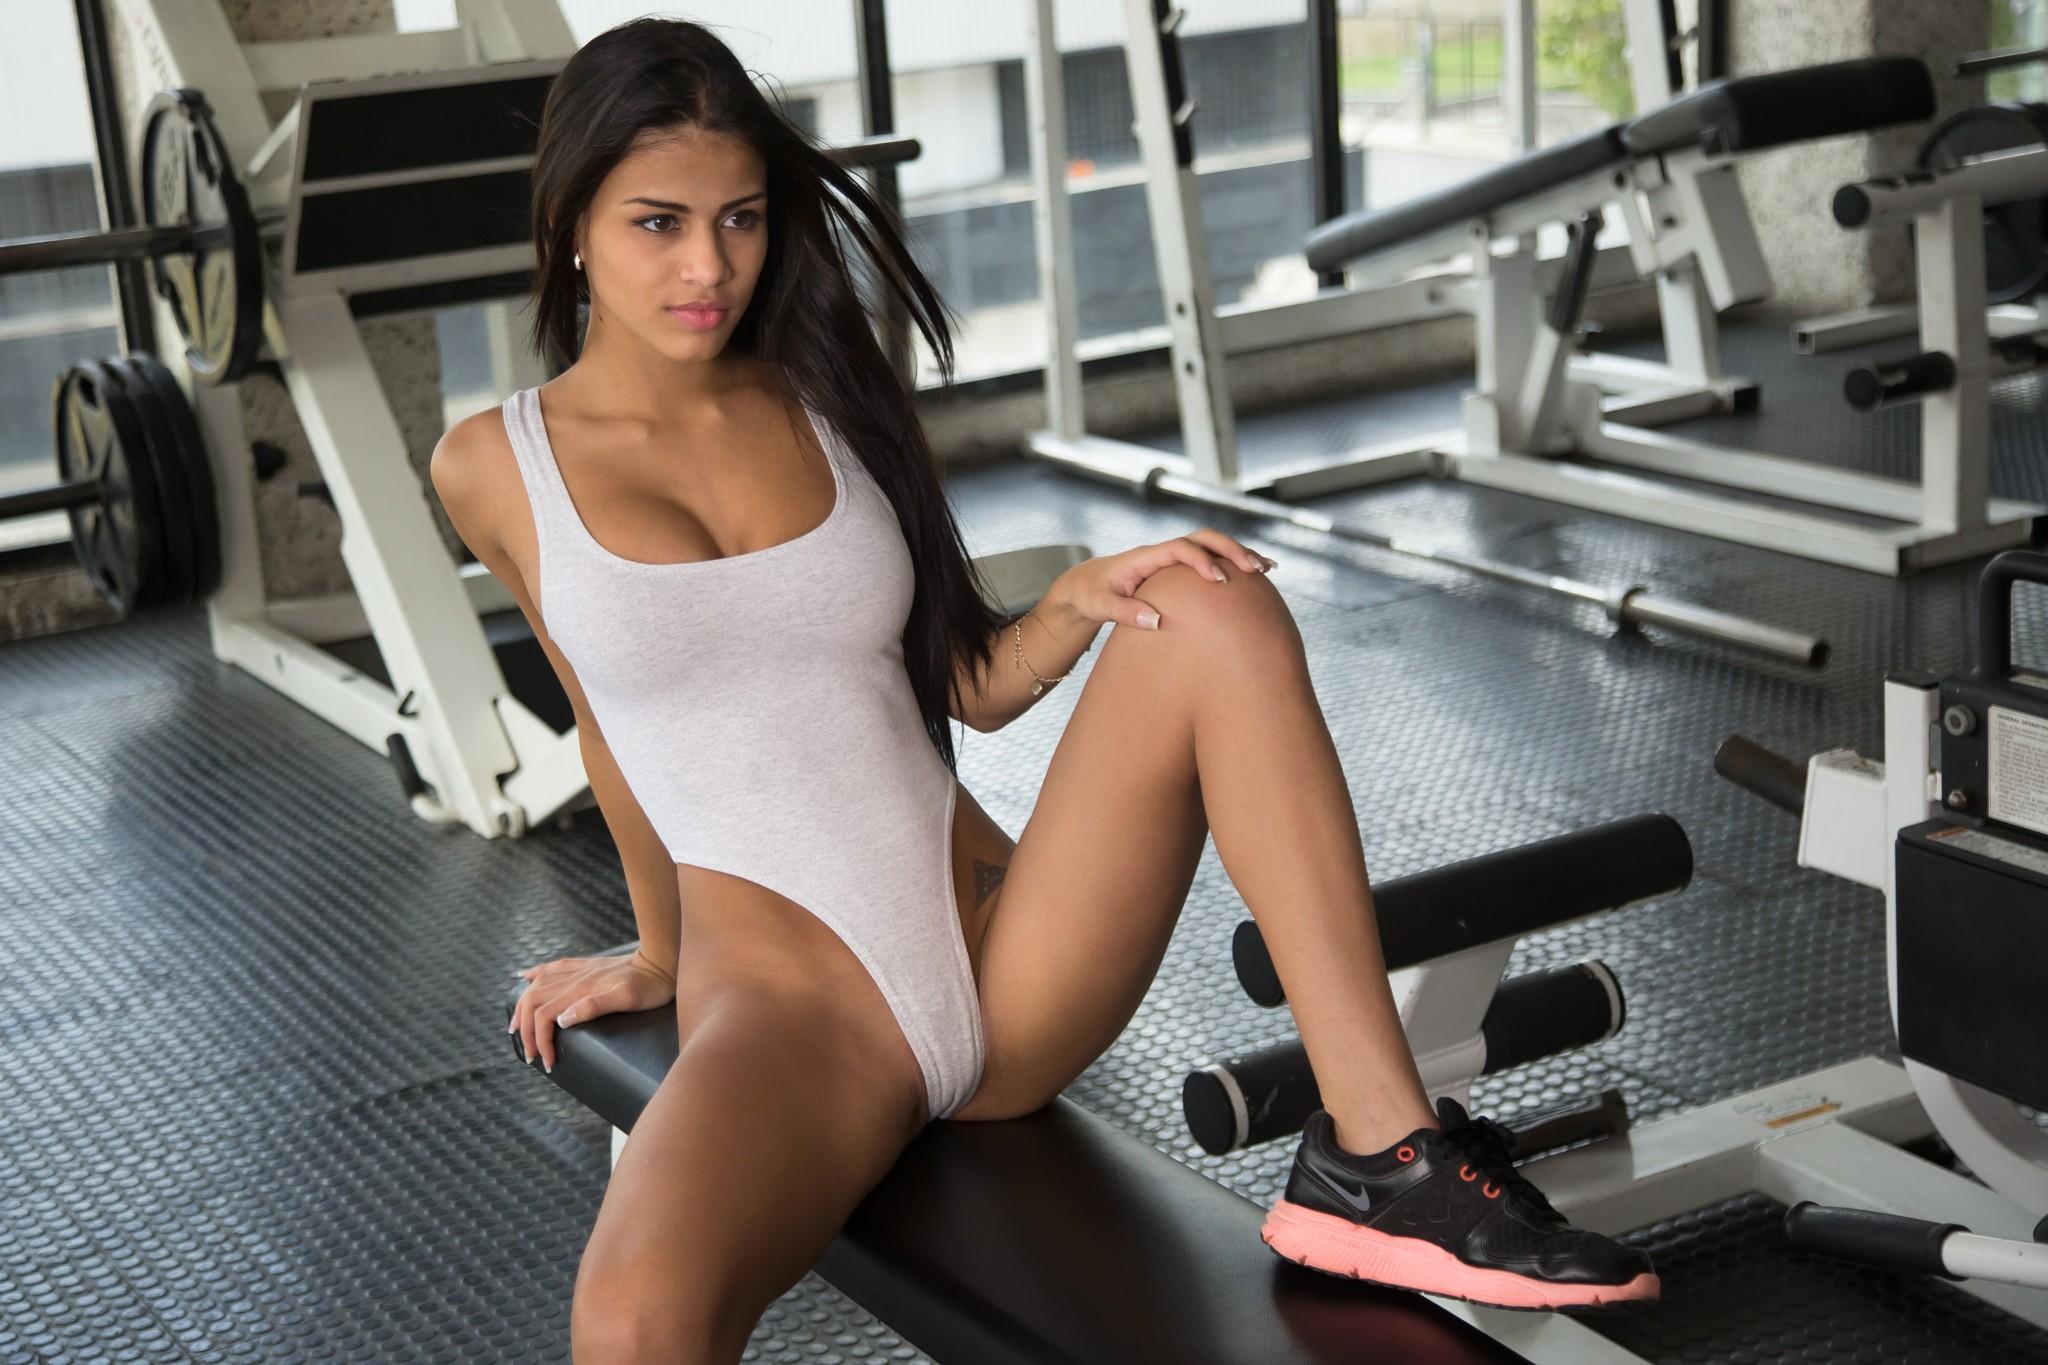 Раздвинула ноги с спортзале